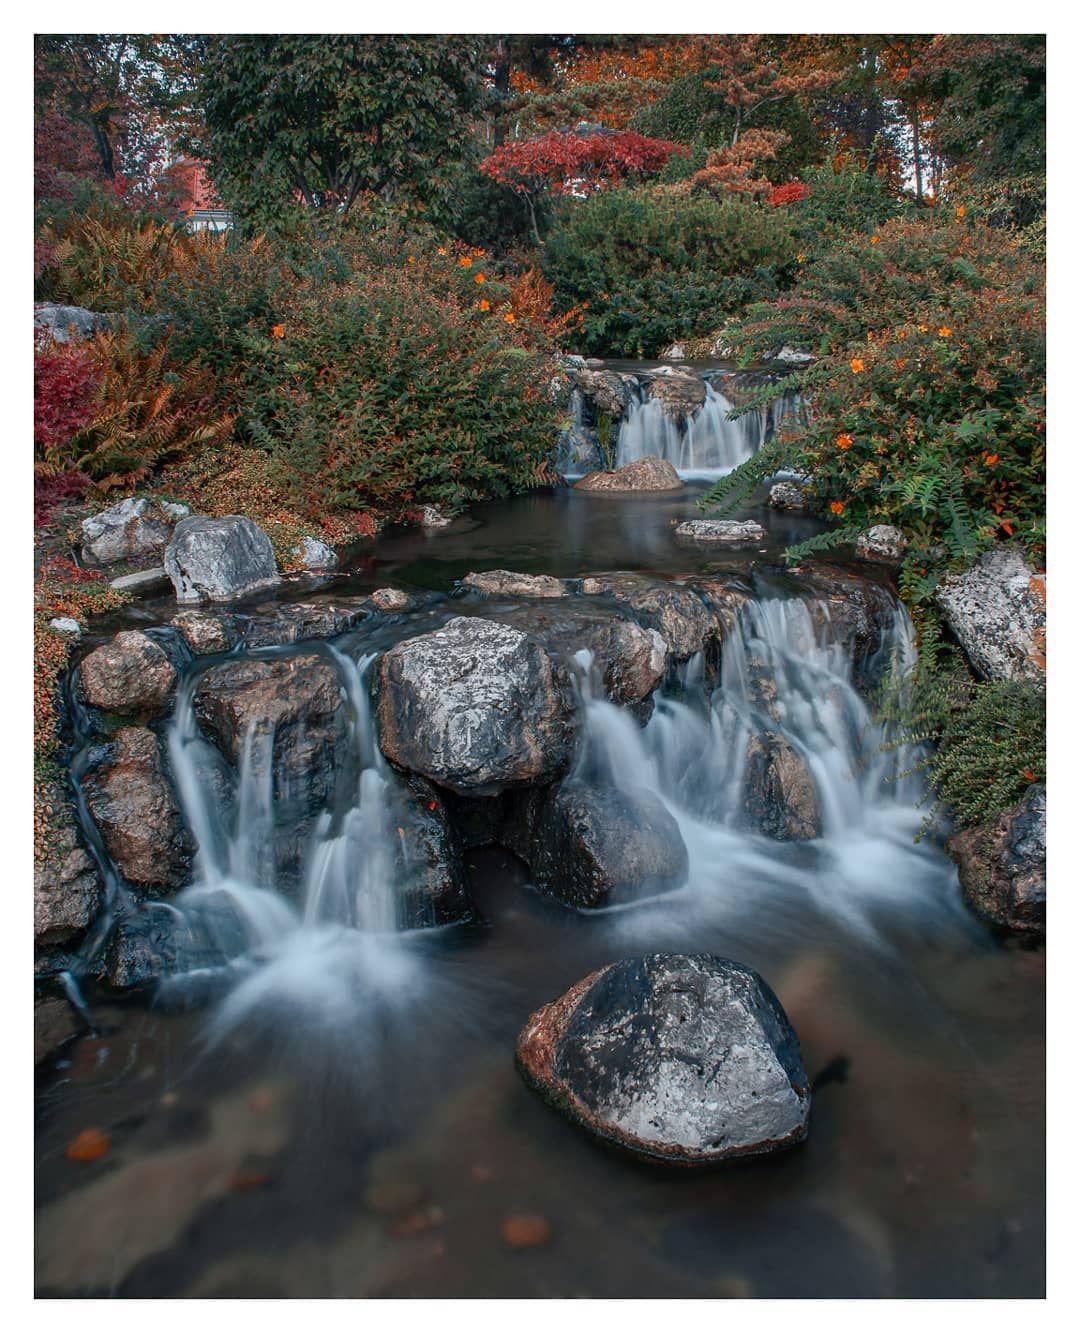 Setagaya Park Setagayapark Japanischergarten Garten Waterfall Herbst Autumn Nature Naturephotogra Vienna Park Waterfall Nature Photography